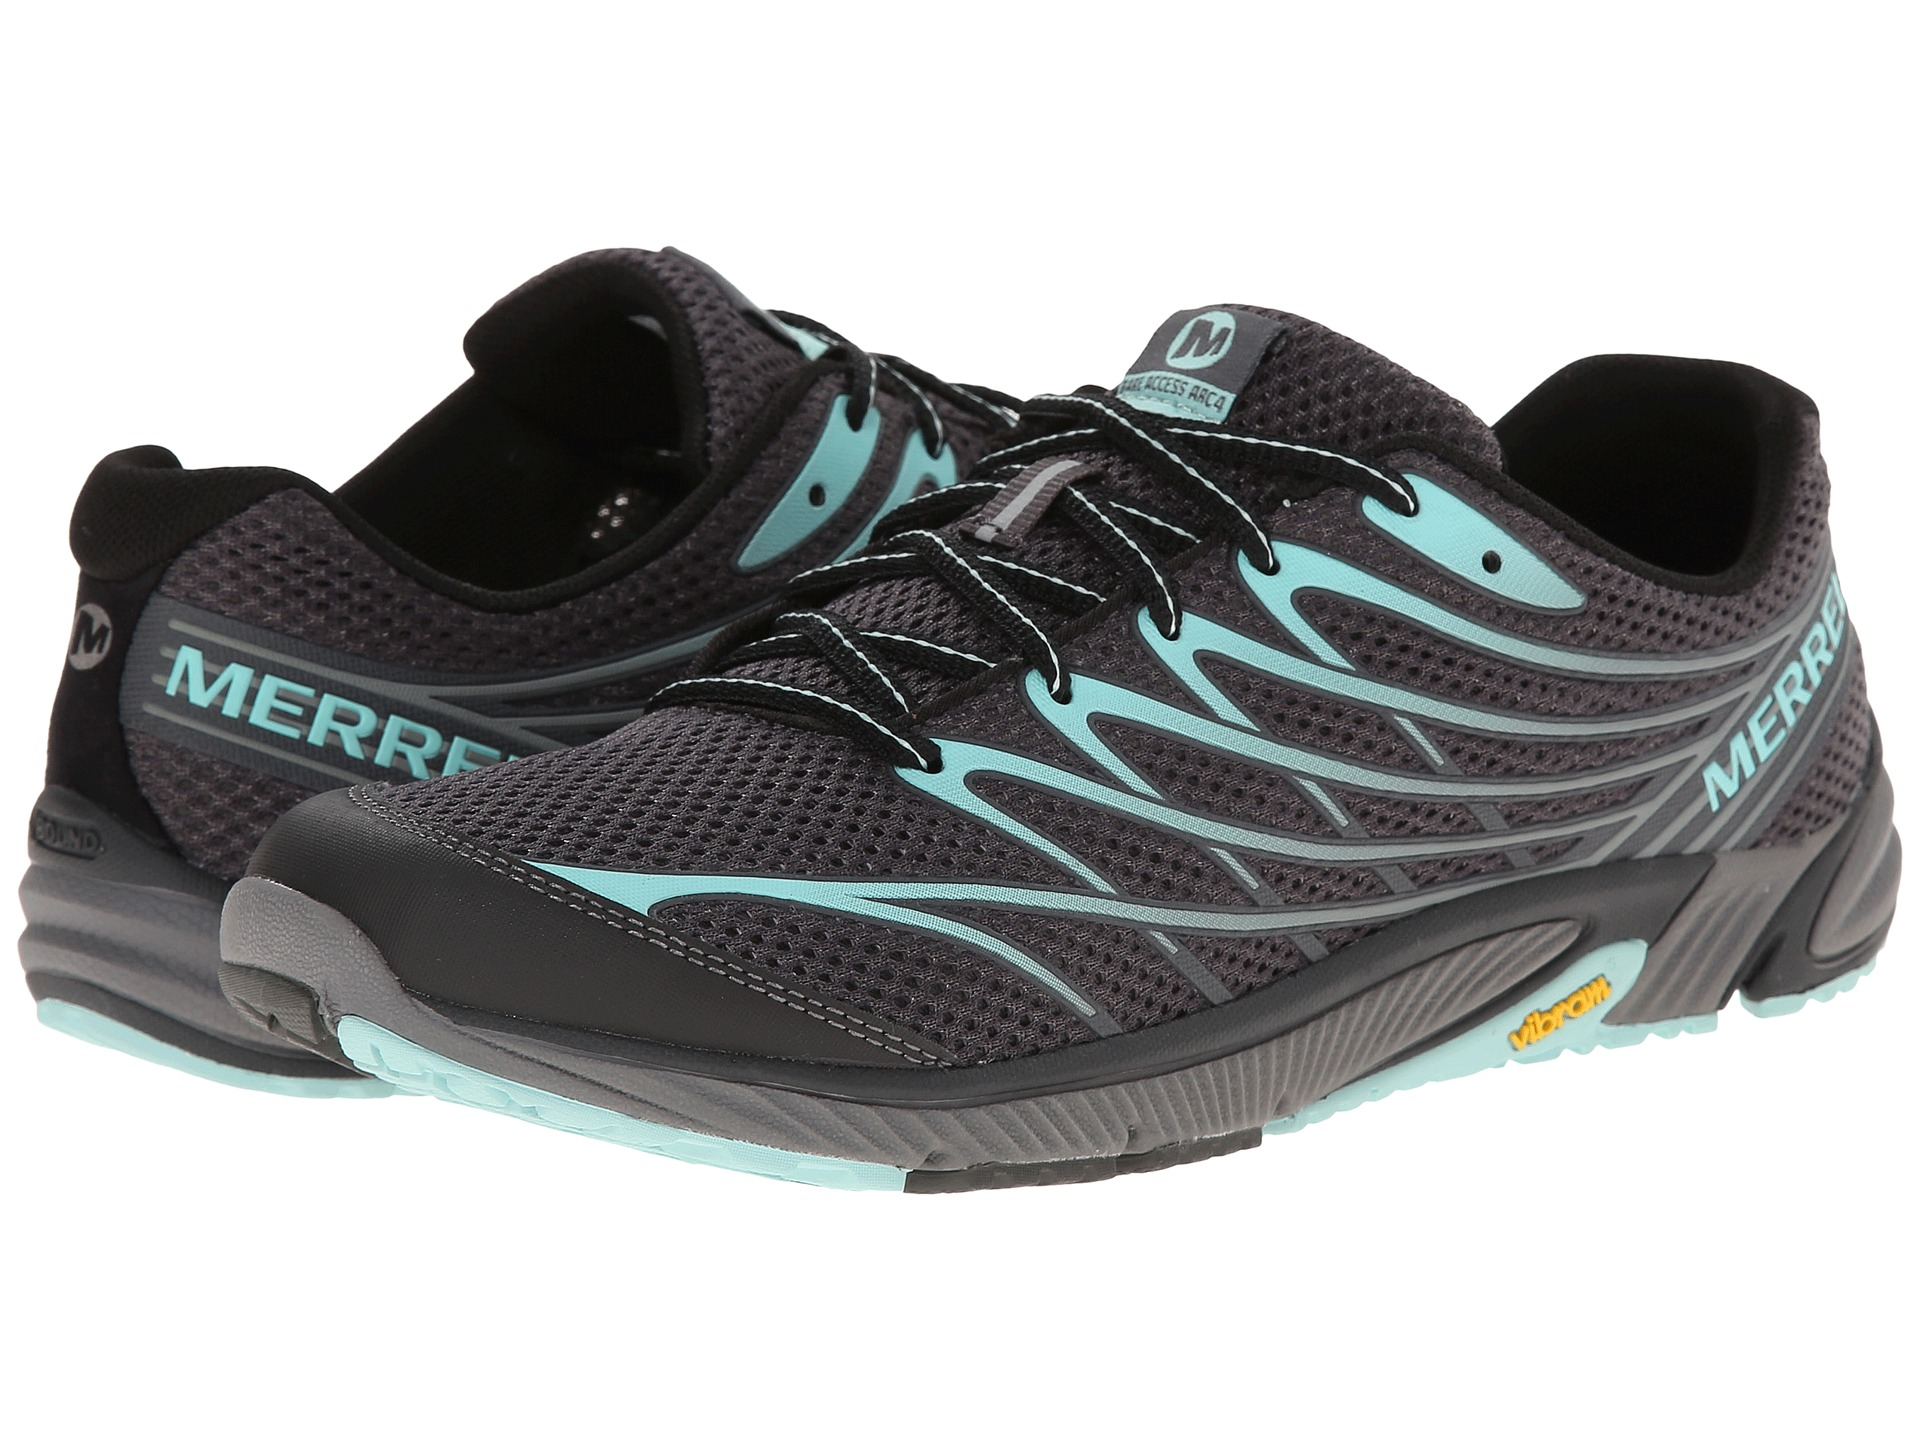 Merrell Shoes For Women